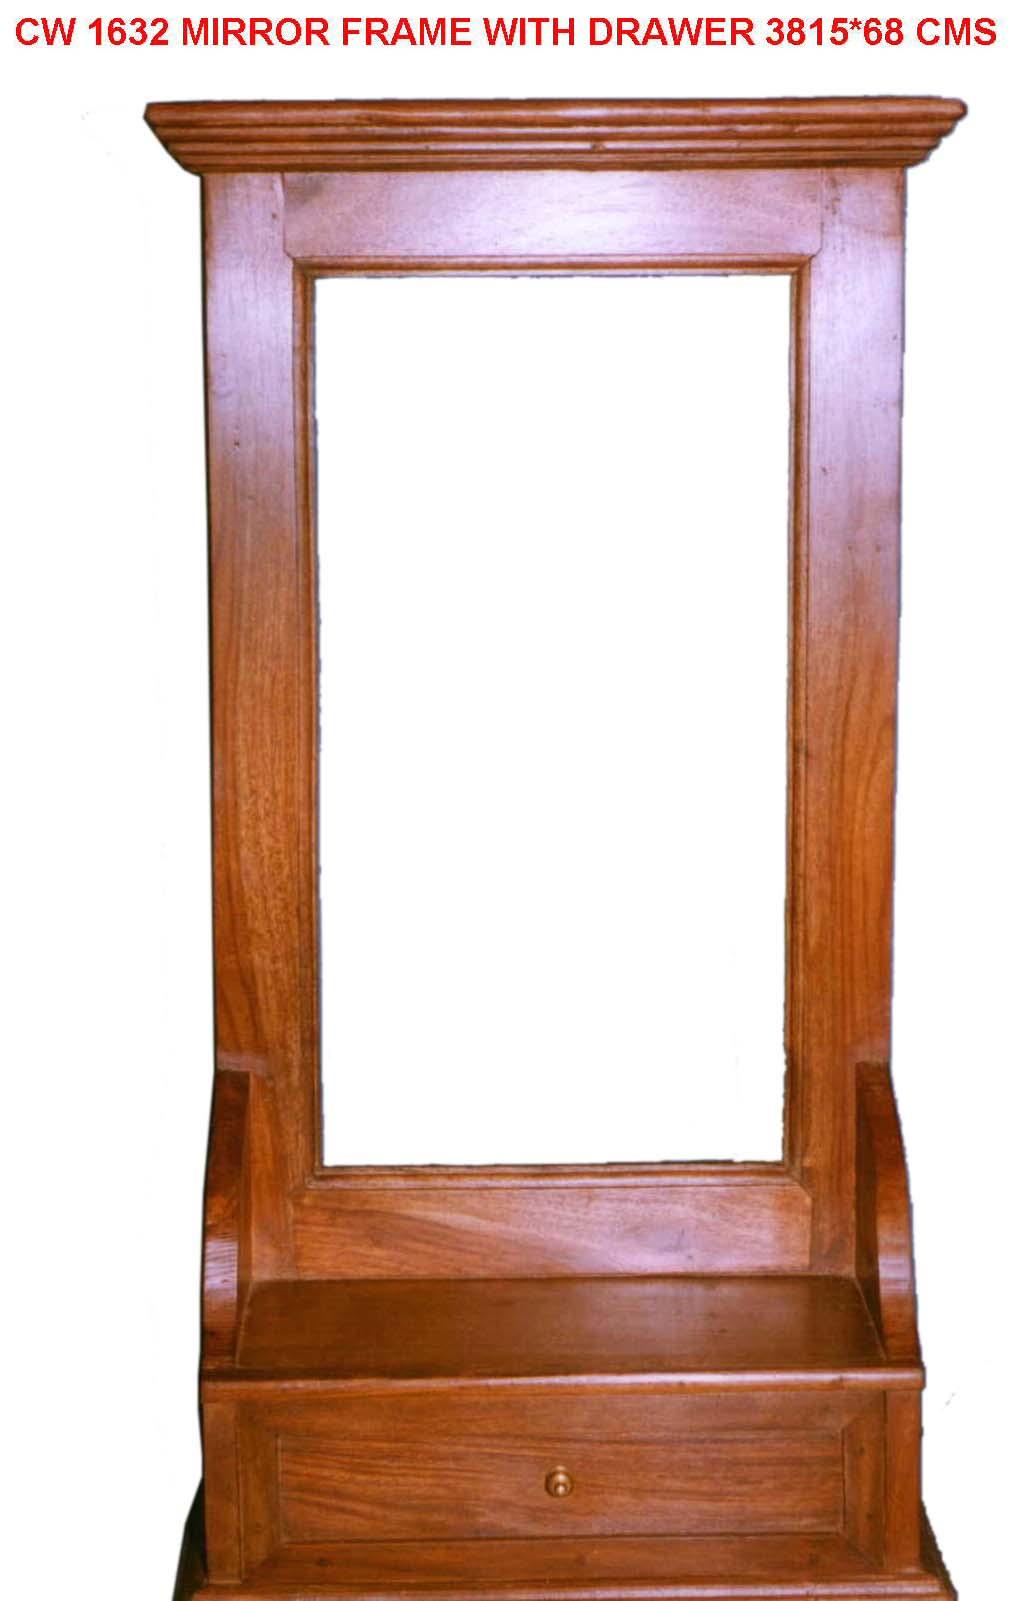 Marco de espejo madera con caj n artesan a madera - Espejo marco madera ...